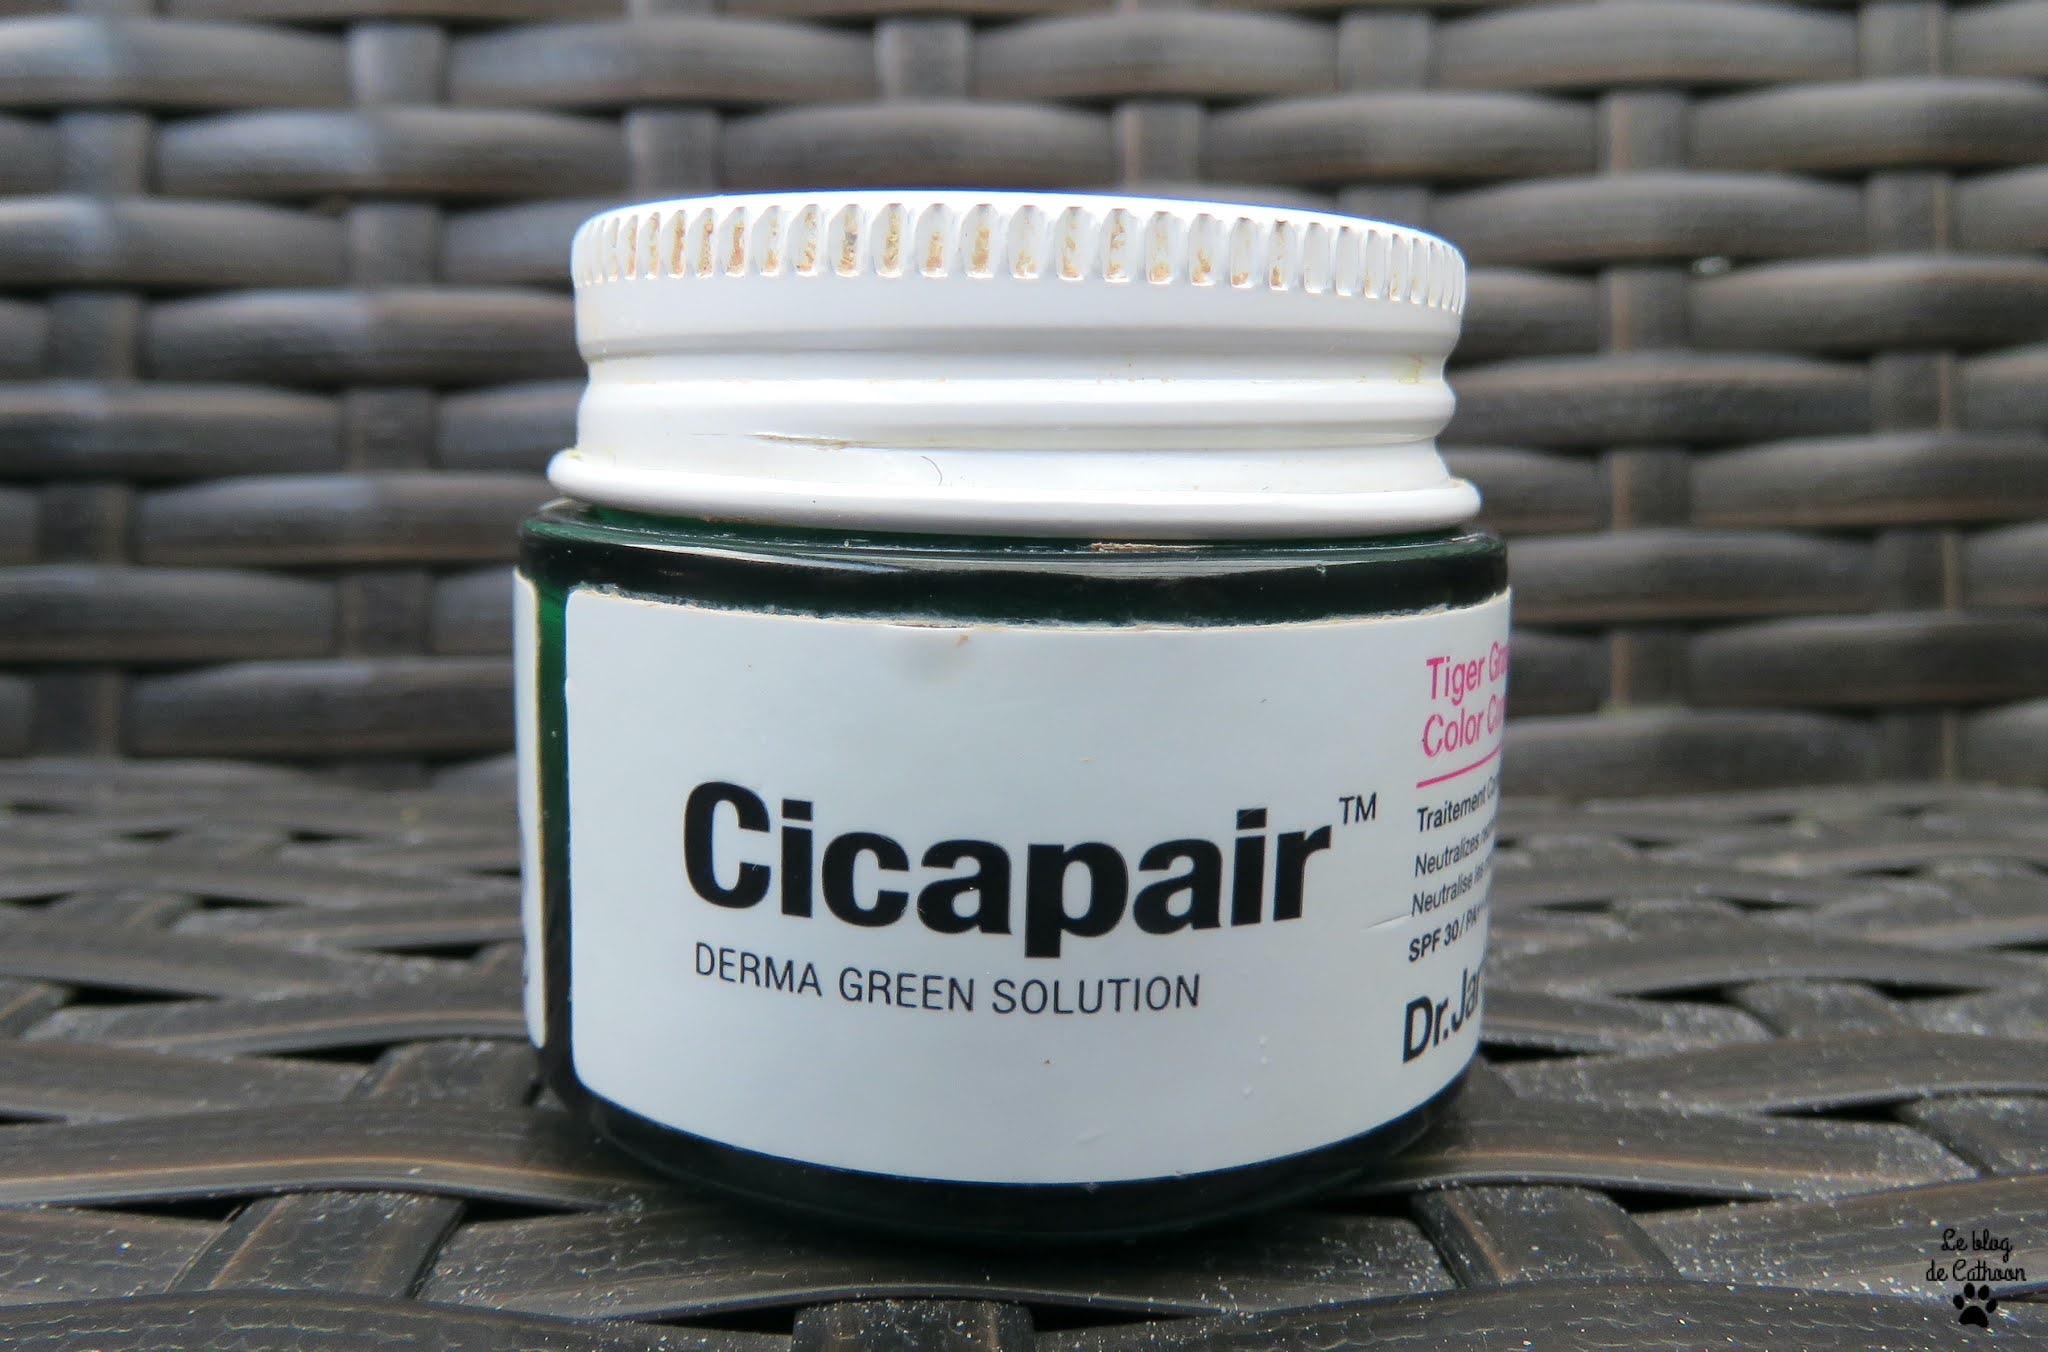 Cicapair - Tiger Grass Color Correcting Treatment - Dr. Jart+